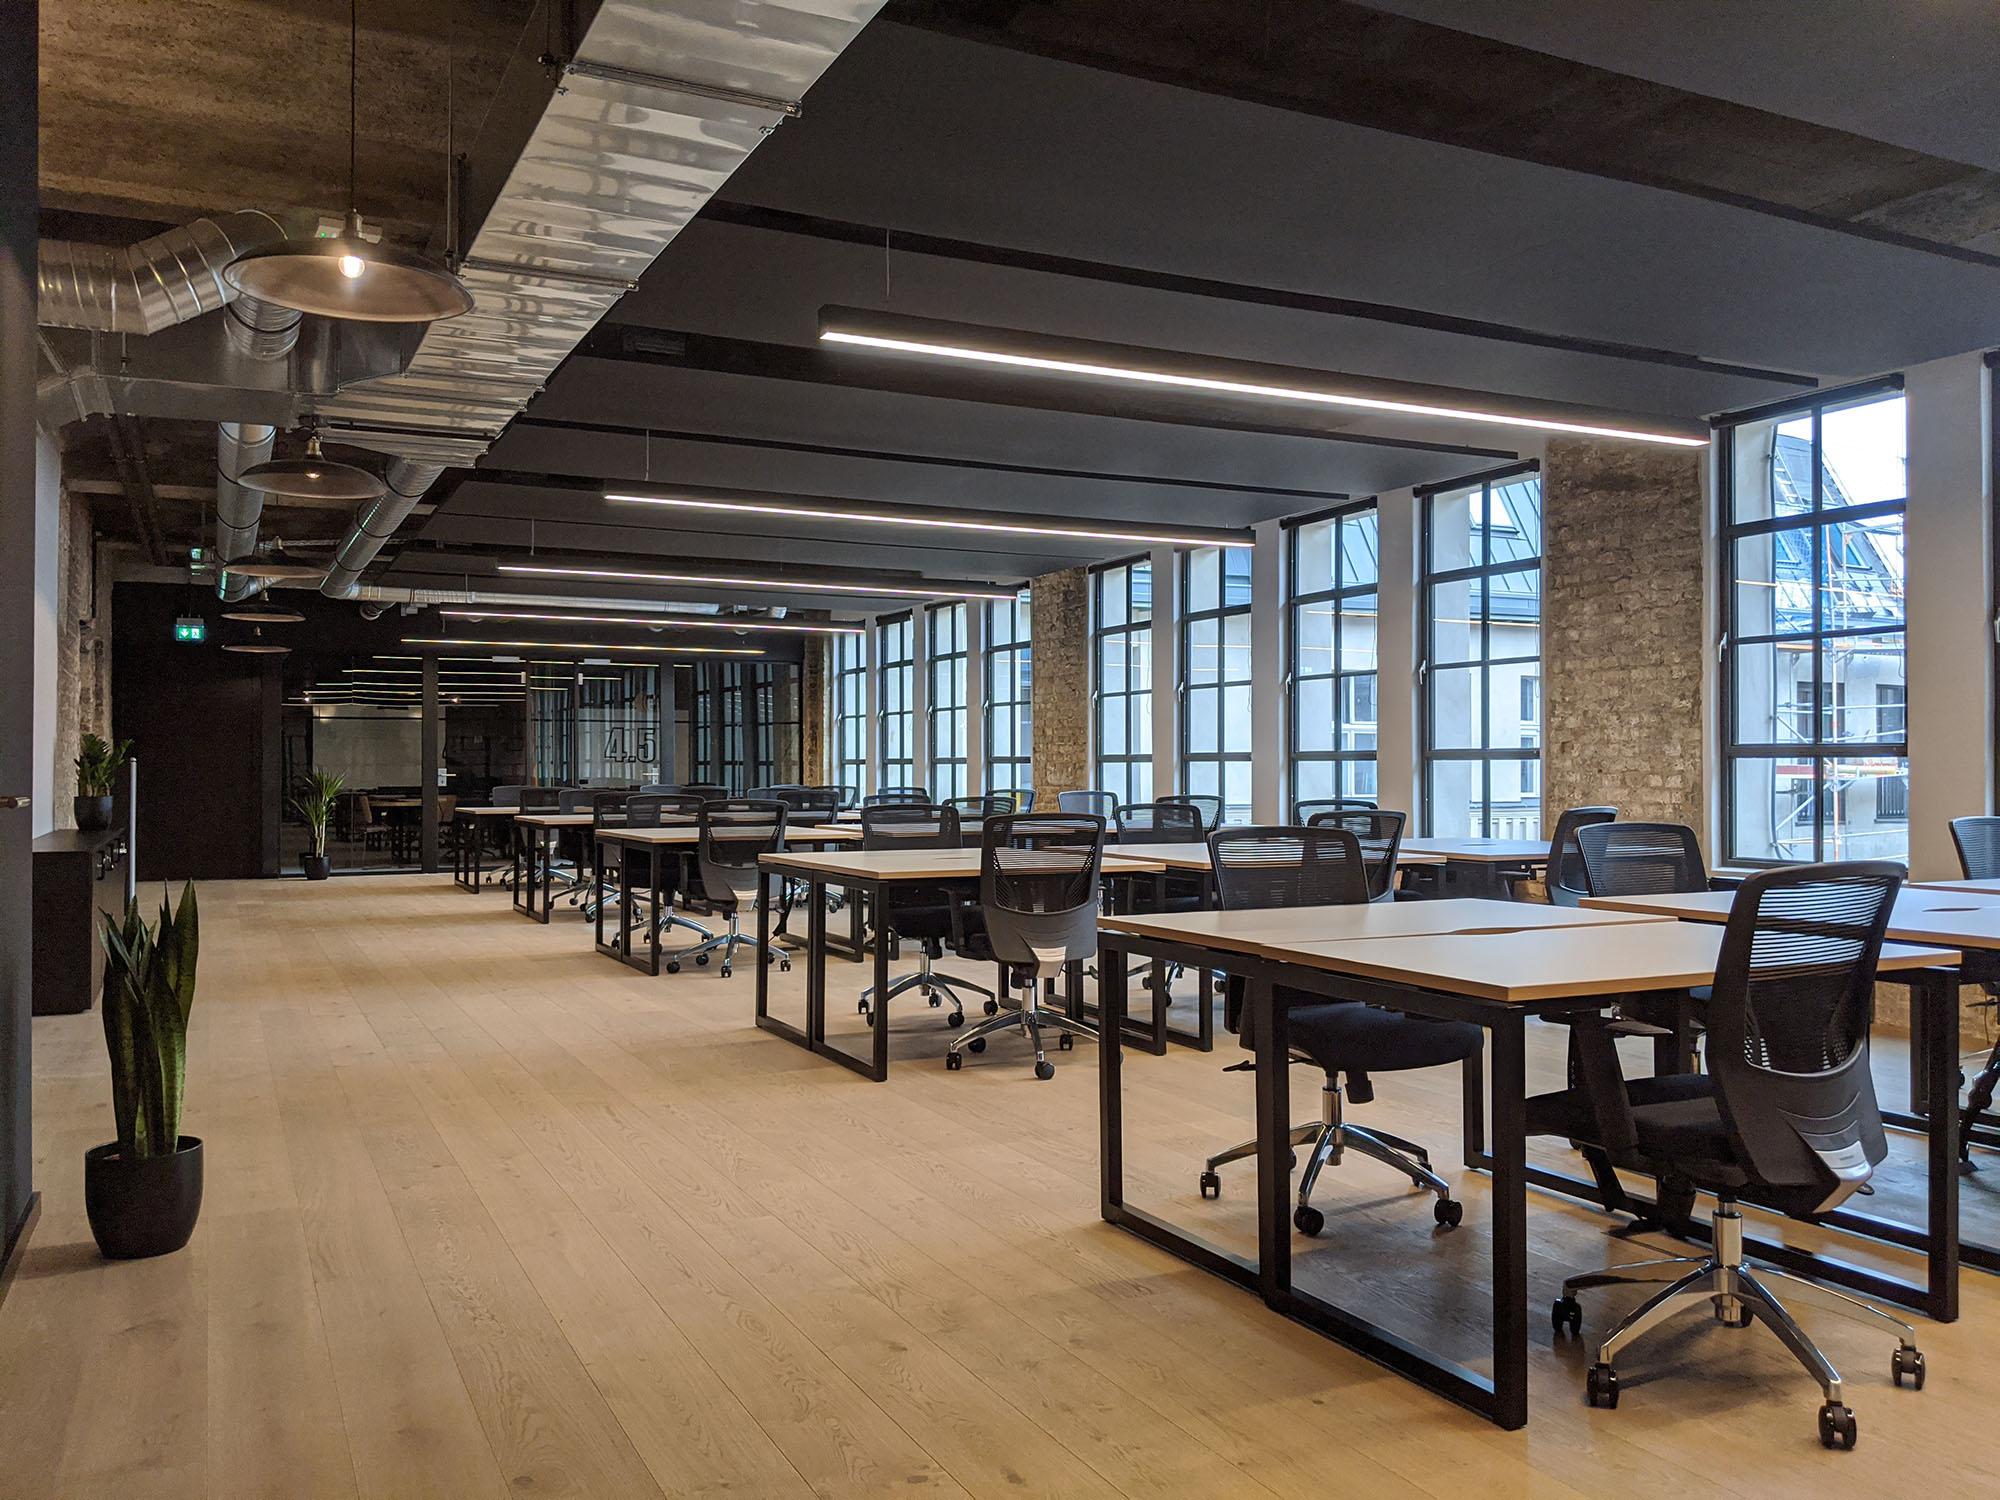 66 person workspace